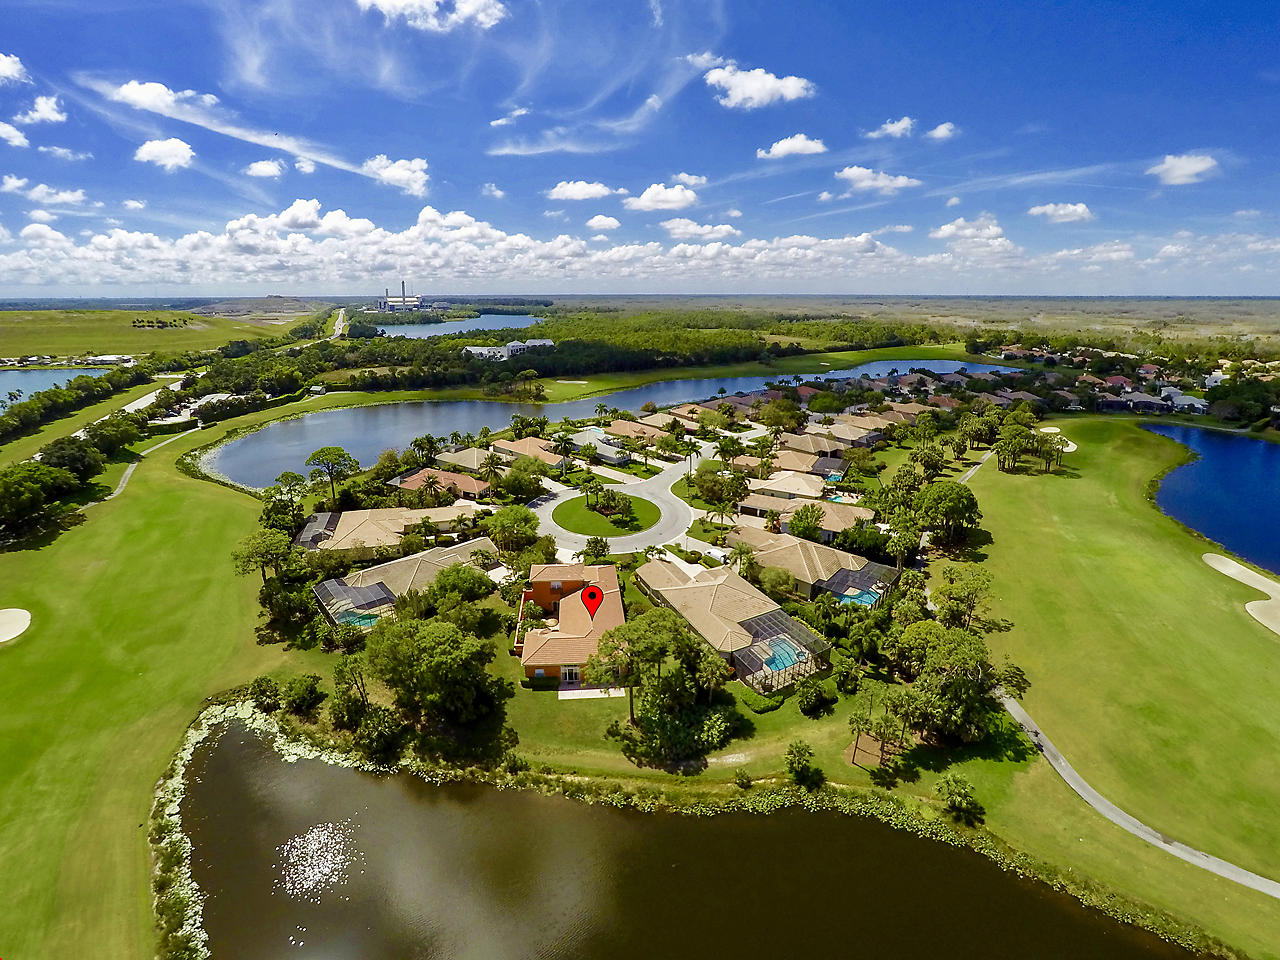 7452 Ironhorse Boulevard, West Palm Beach, Florida 33412, 4 Bedrooms Bedrooms, ,3.1 BathroomsBathrooms,A,Single family,Ironhorse,RX-10611319